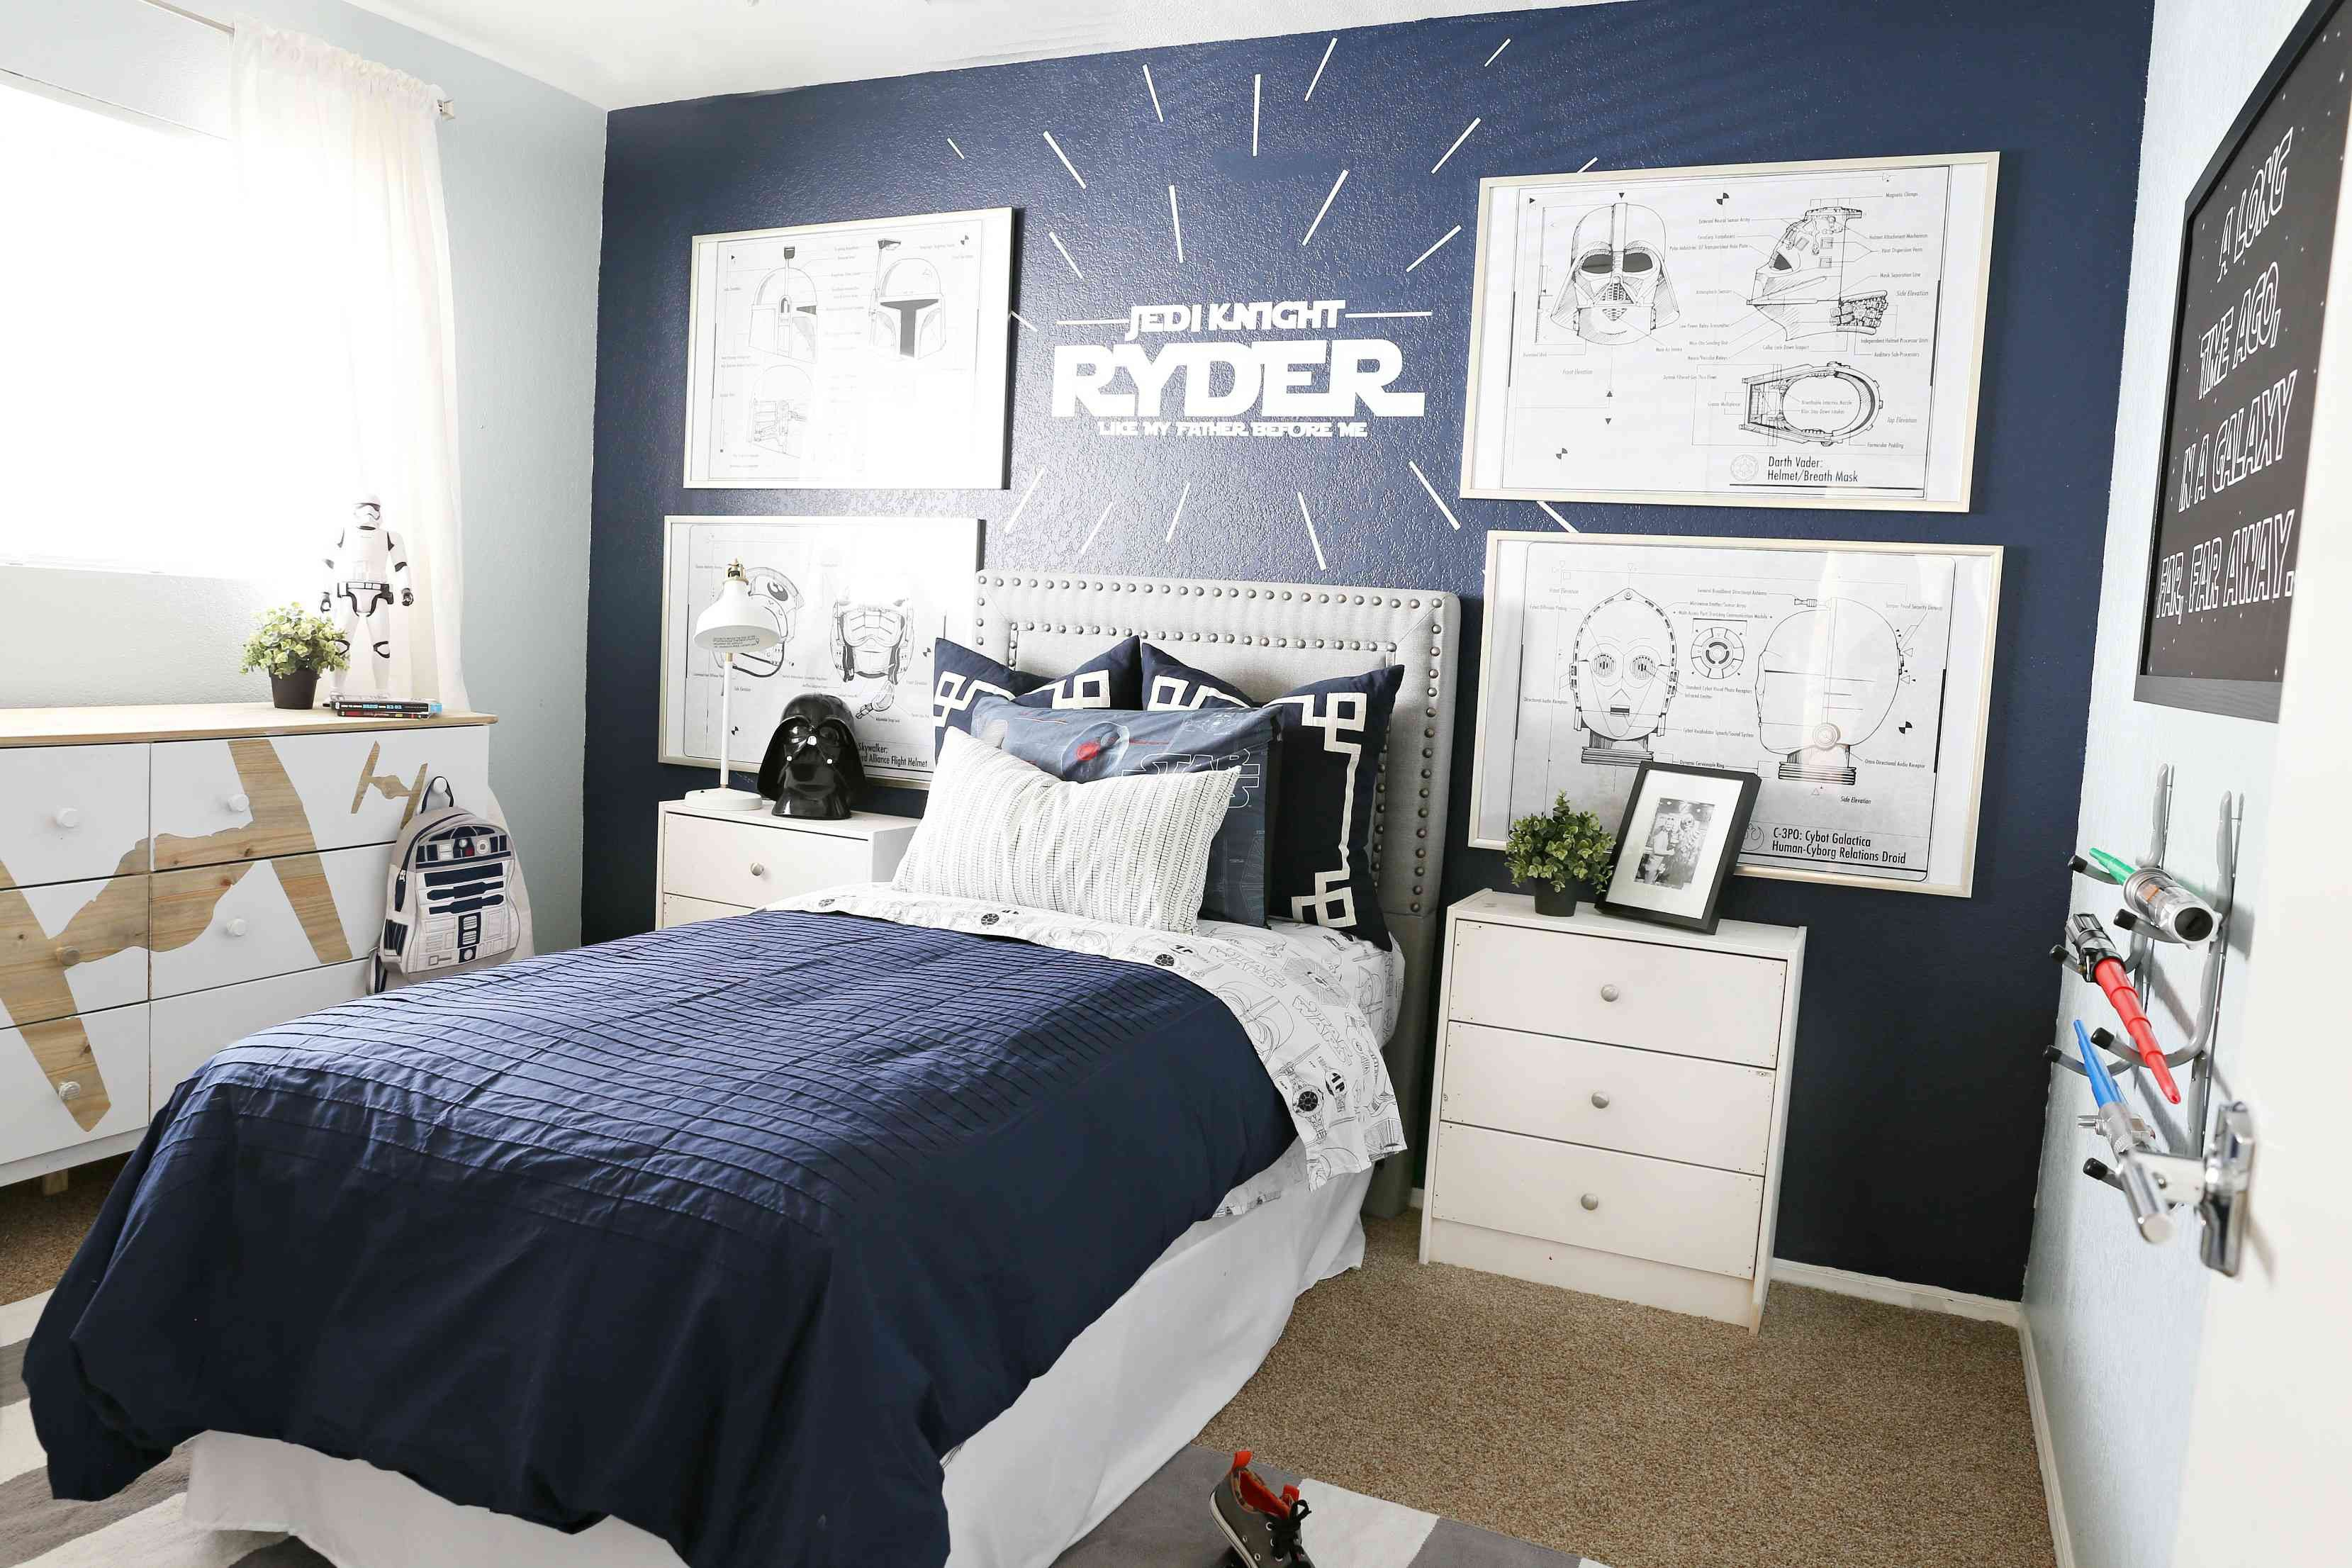 10 Year Old Boy Bedroom Ideas Best Of 16 Creative Bedroom Ideas for Boys